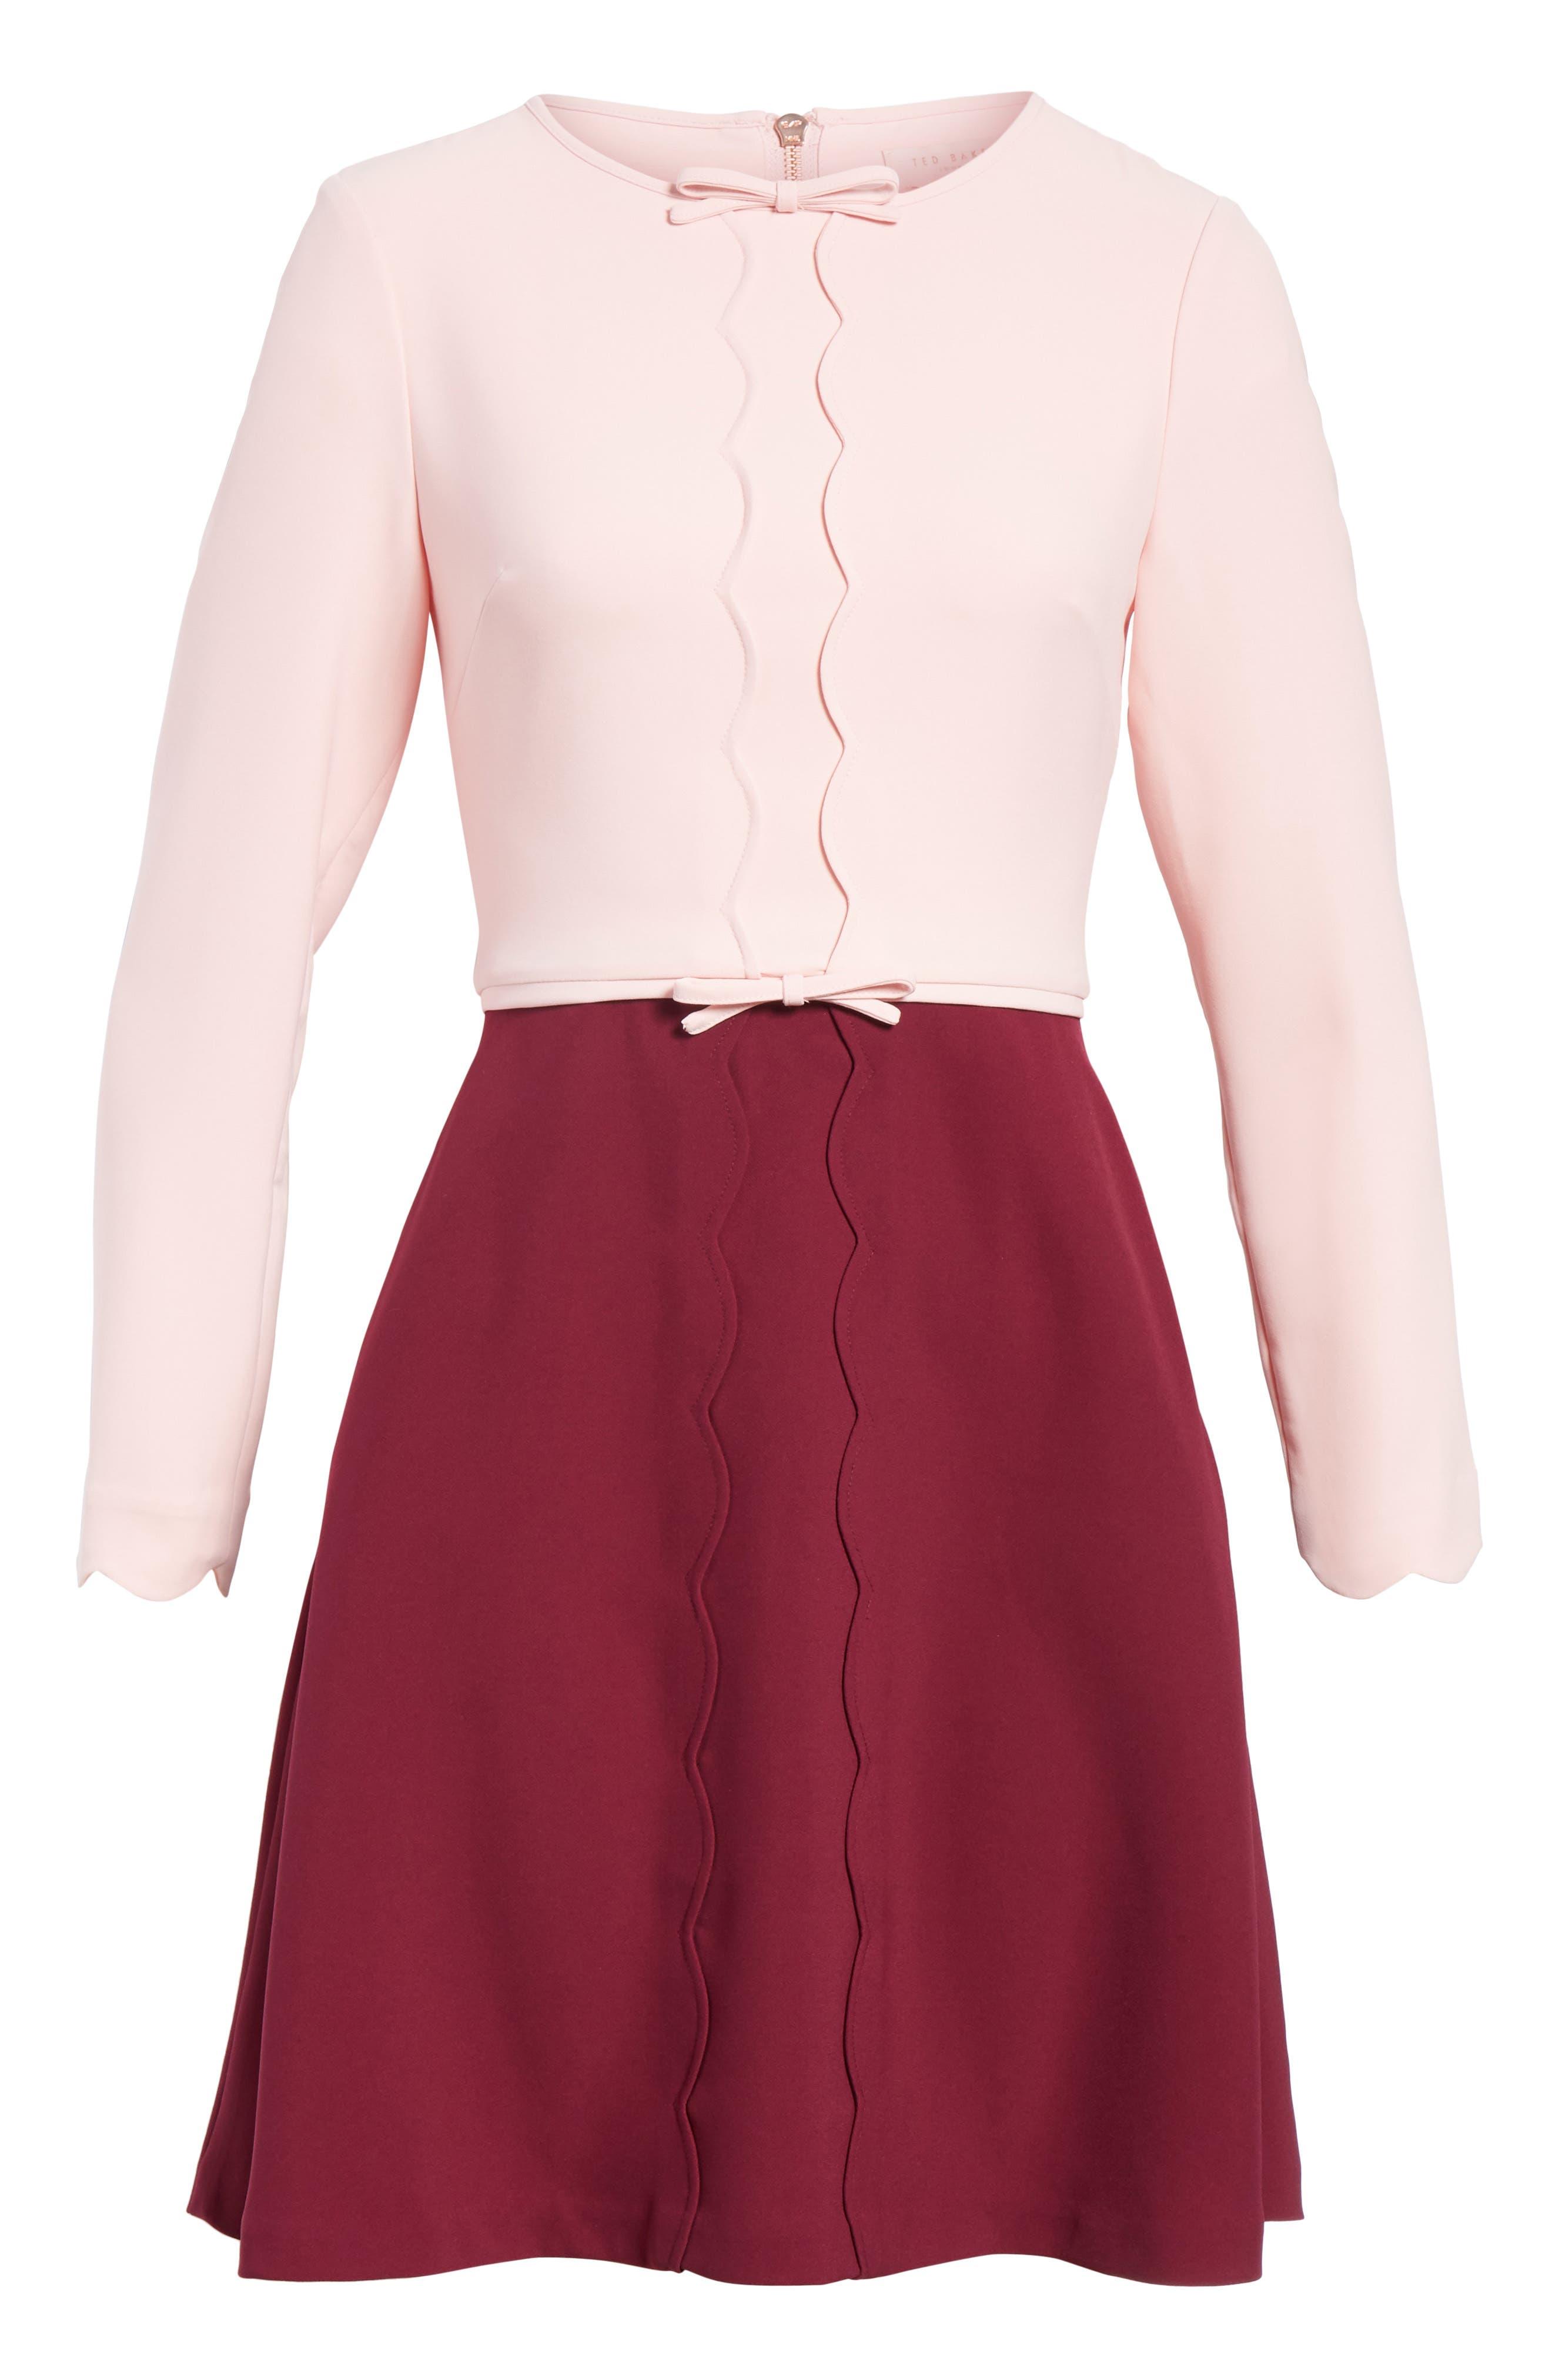 Scalloped A-Line Dress,                             Alternate thumbnail 12, color,